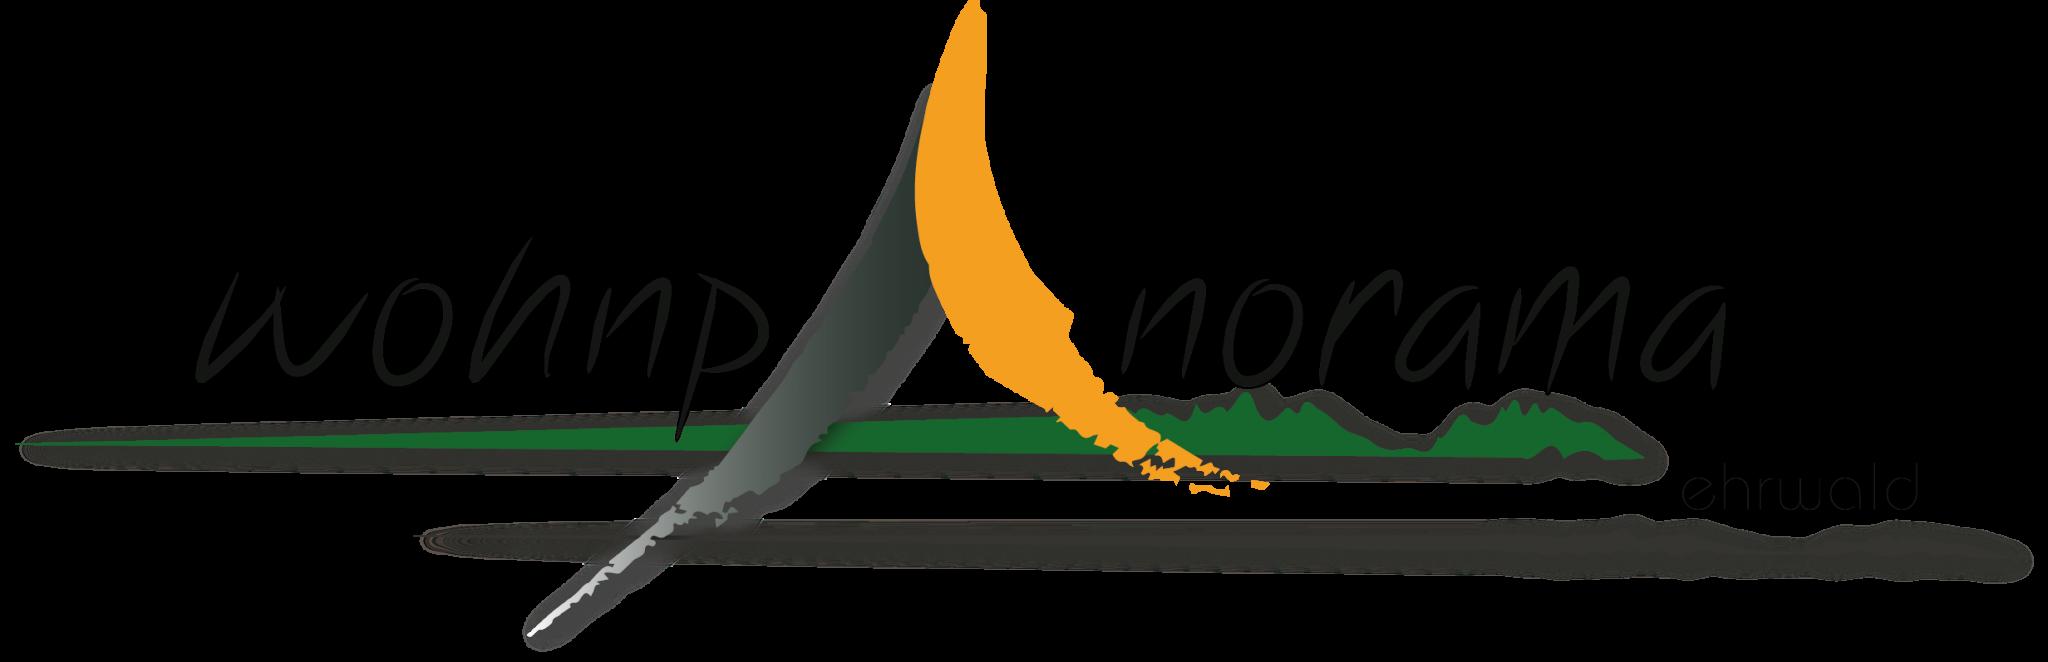 2017.10.10 LGO Wohnpanorama Ehrwald 16-53-A20l